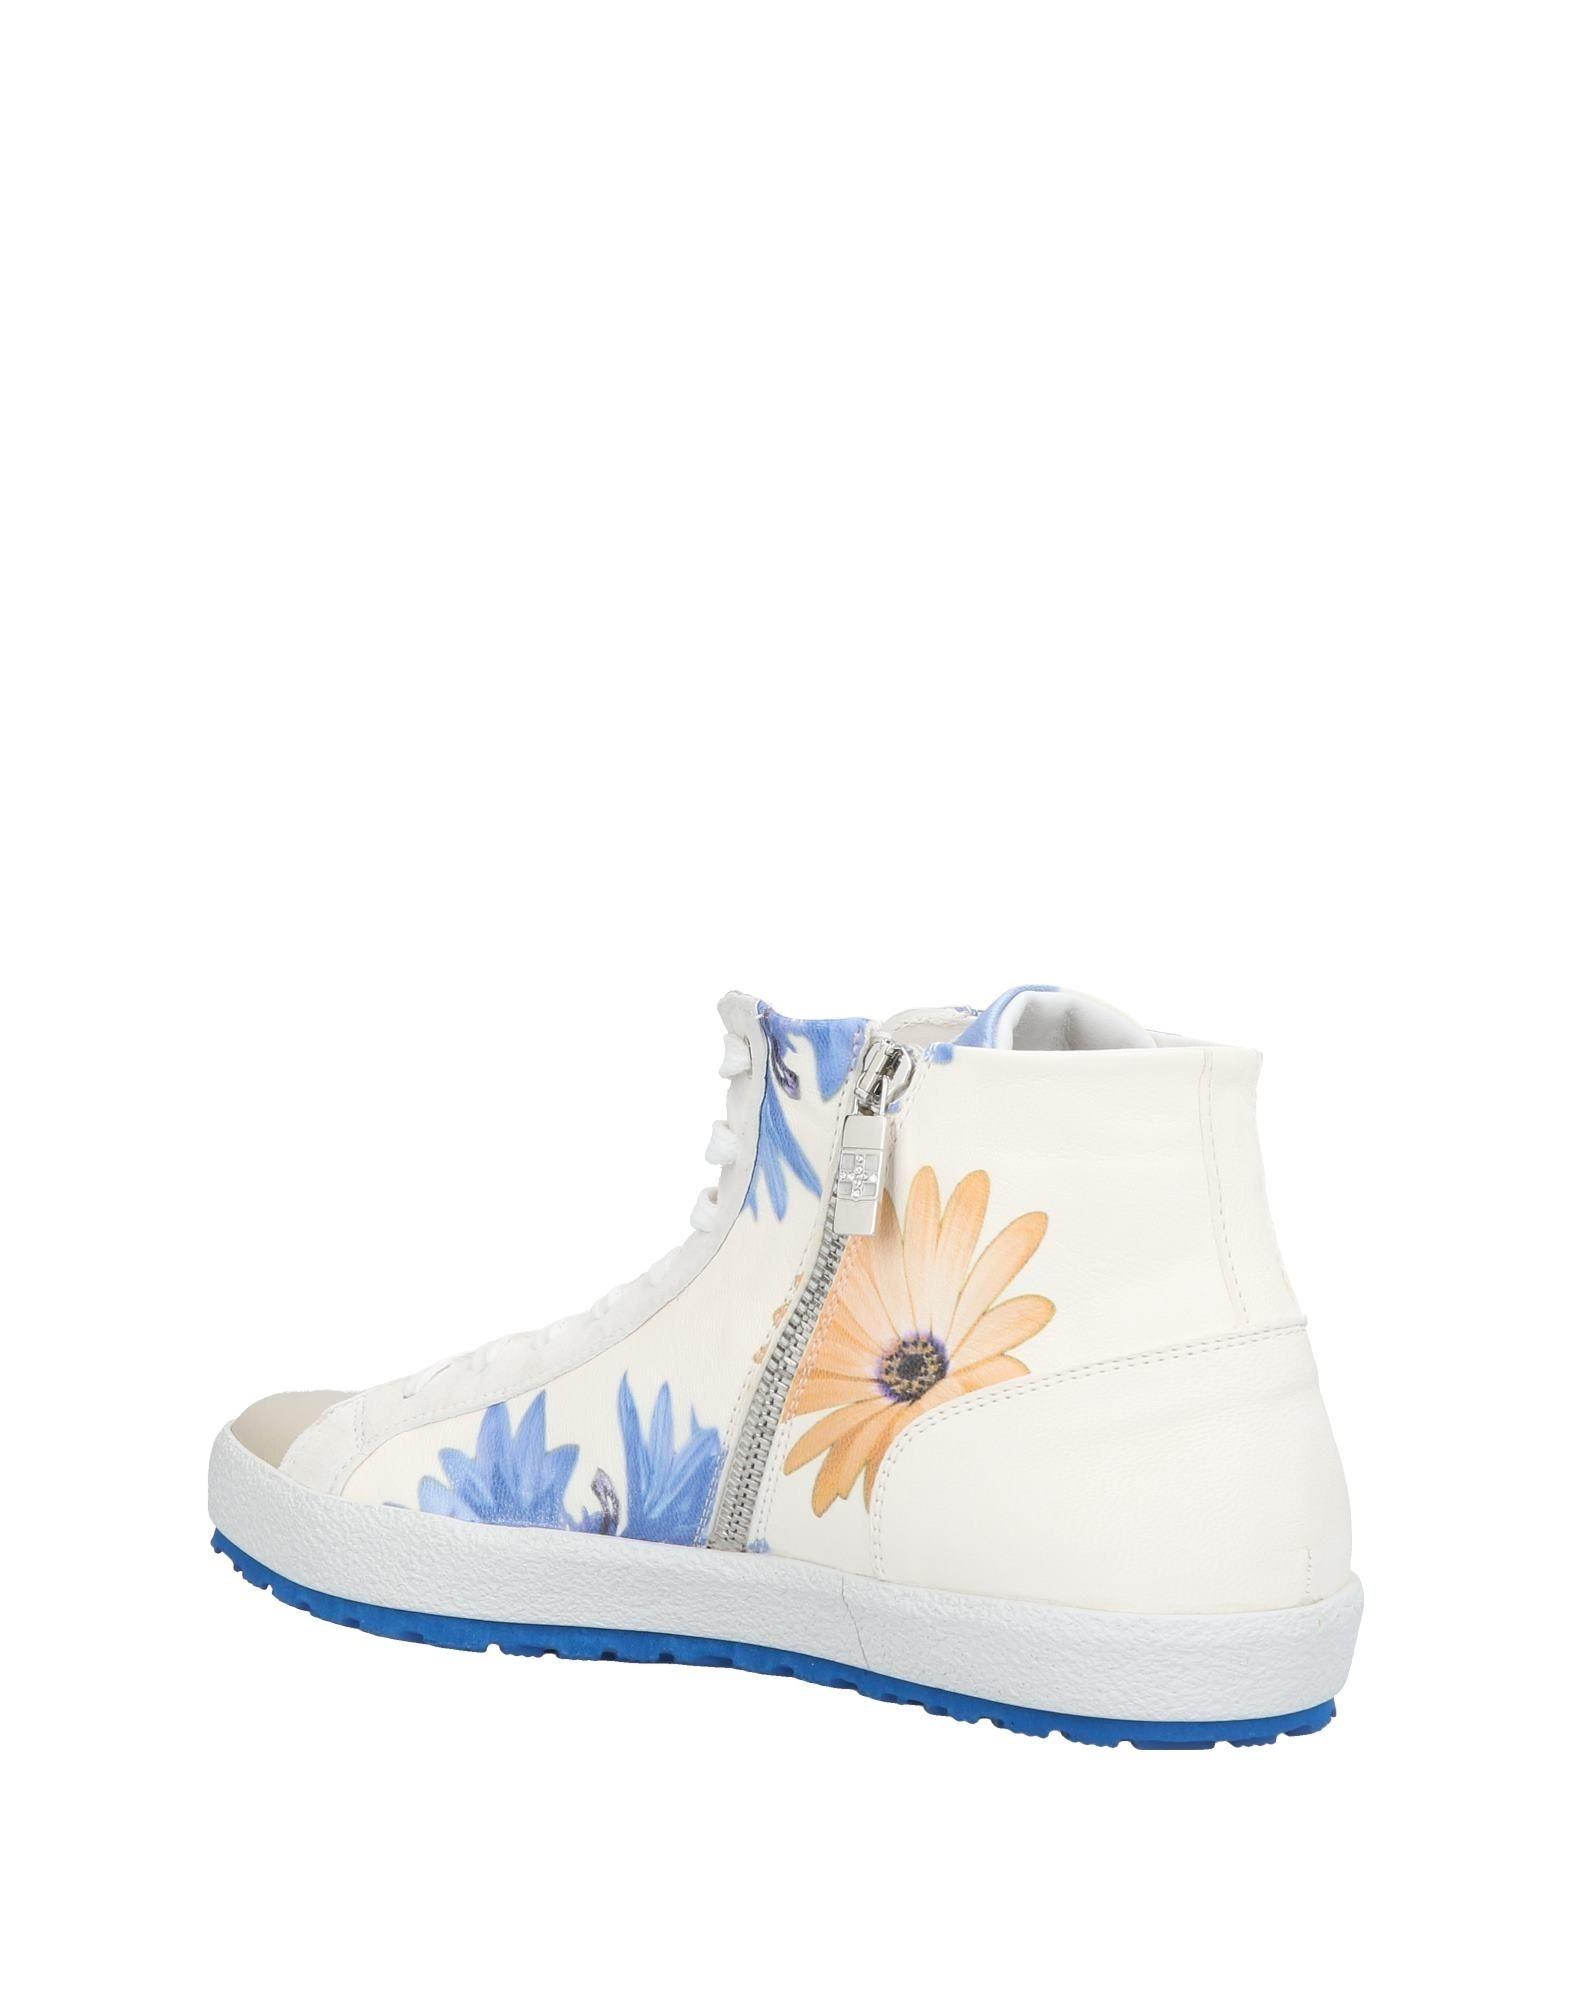 D'Acquasparta Sneakers Damen  11426881VK Gute Qualität Qualität Qualität beliebte Schuhe 7da5a7